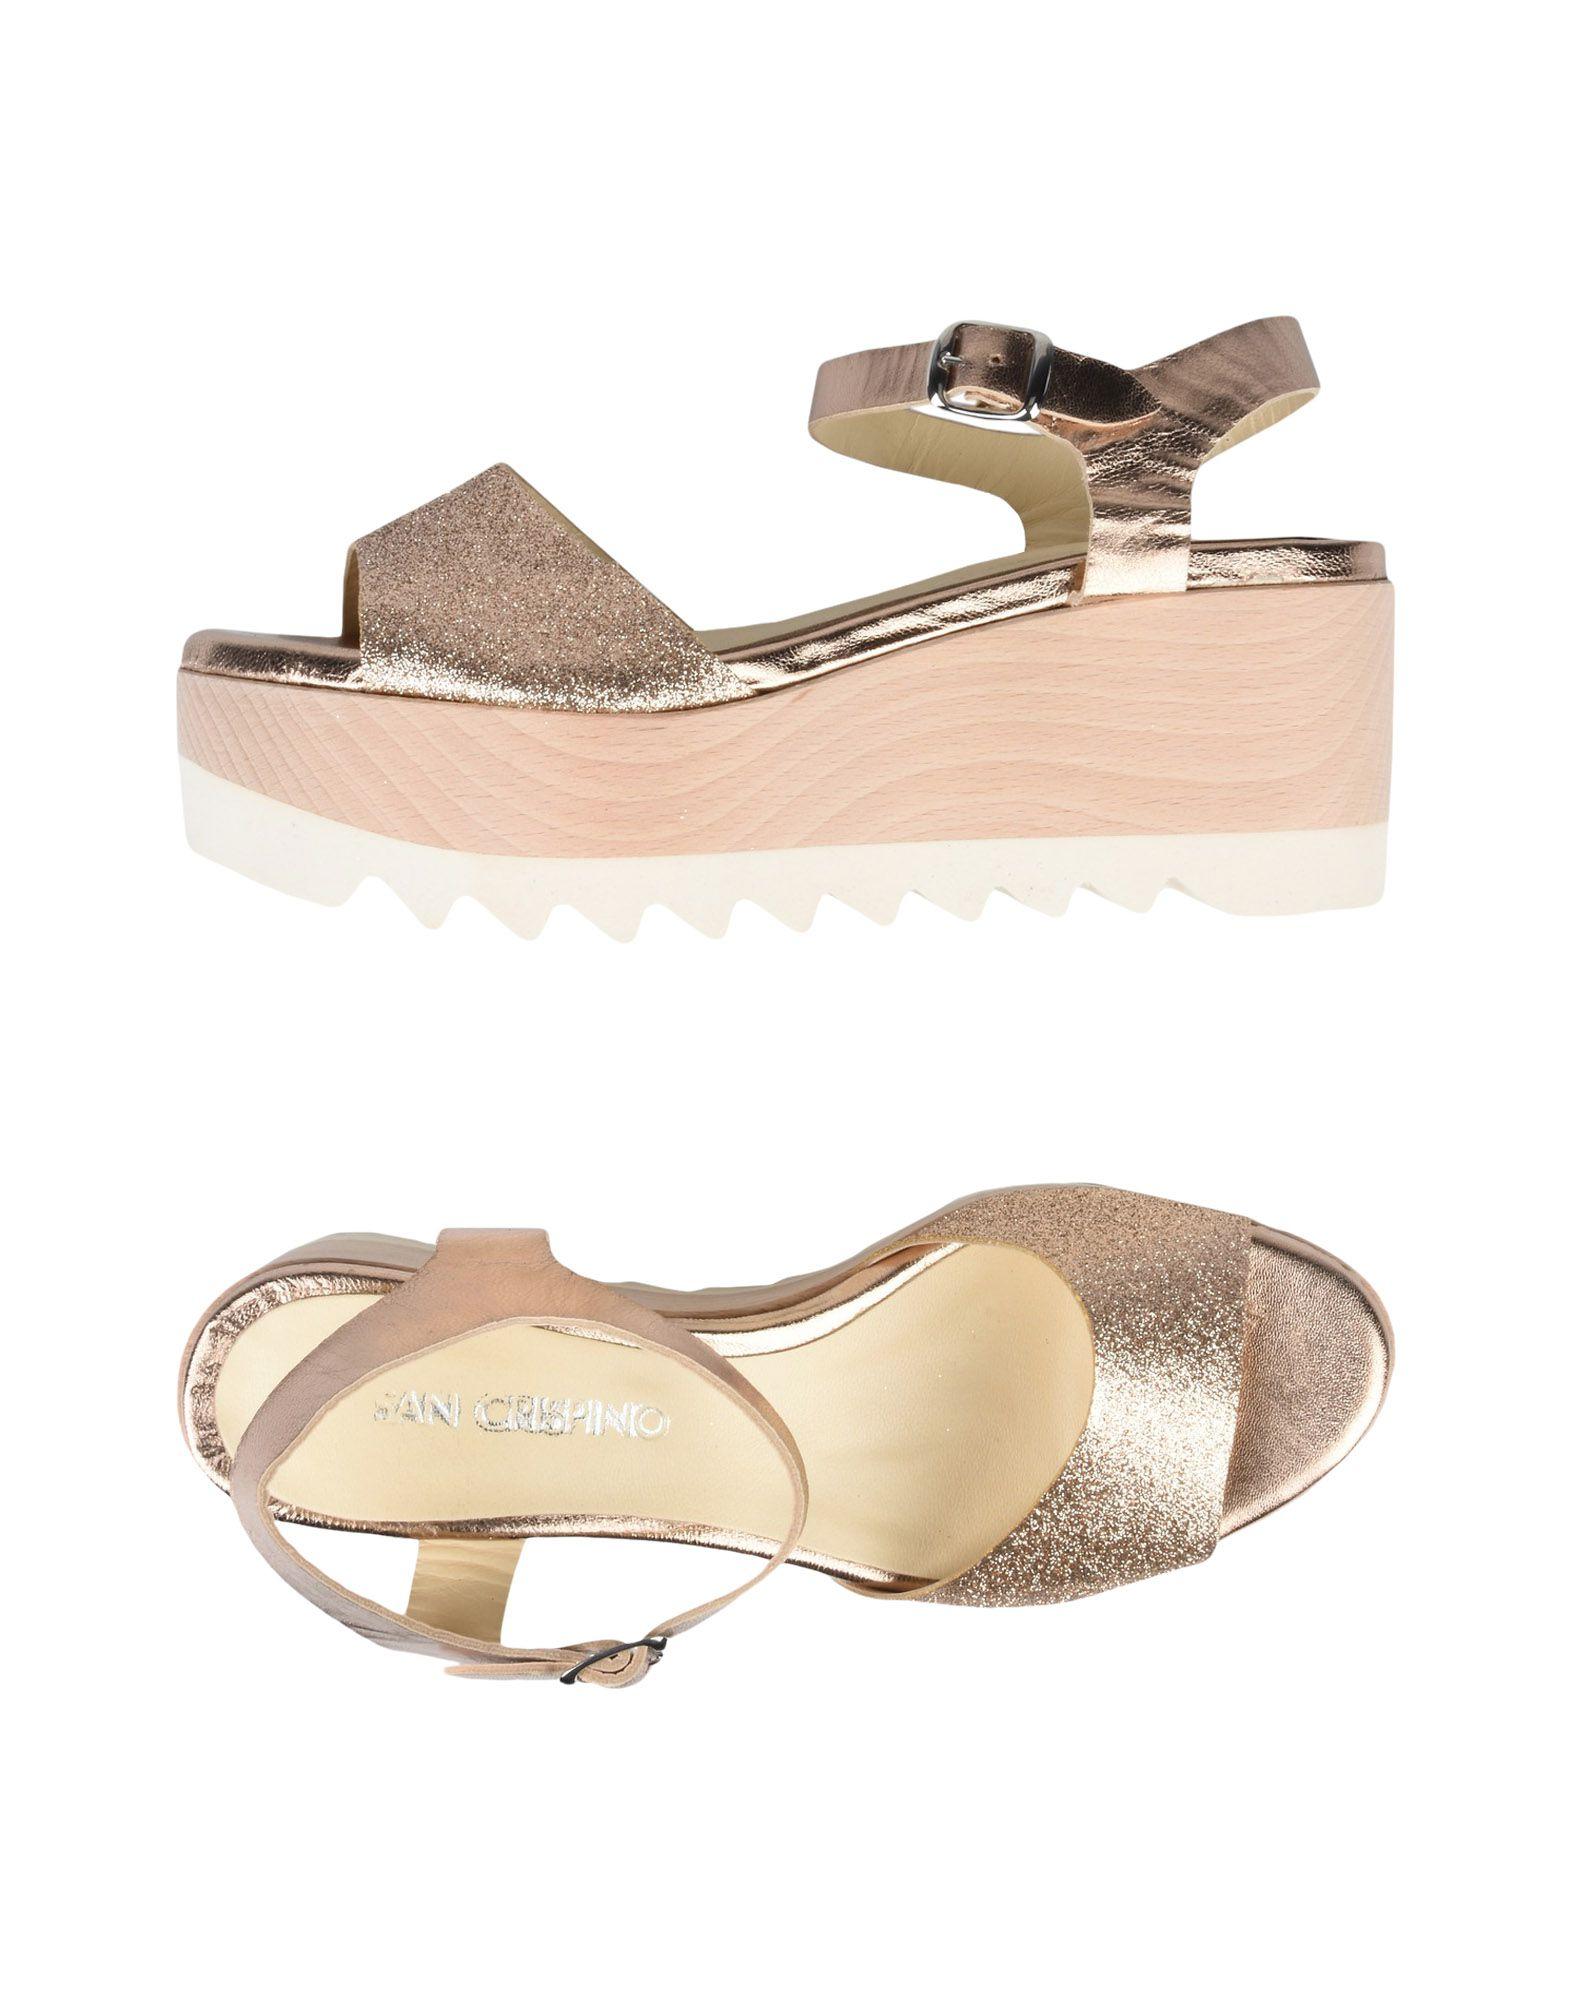 San Crispino Sandalen Damen  11486397FX Gute Qualität beliebte Schuhe